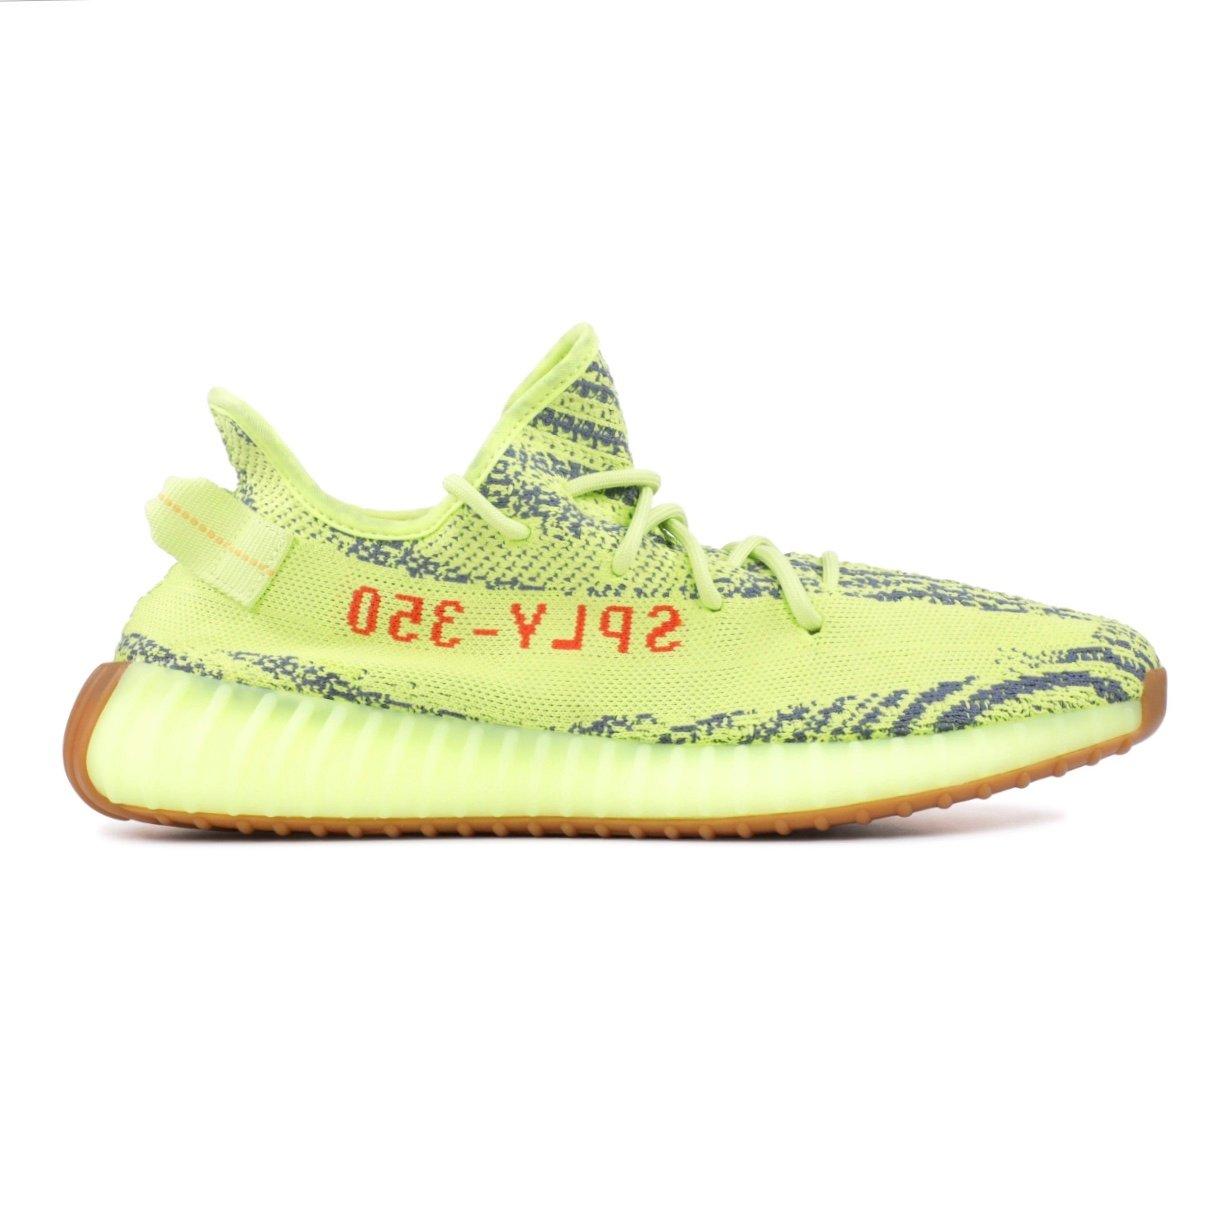 Adidas Yeezy Frozen Yellow size 13